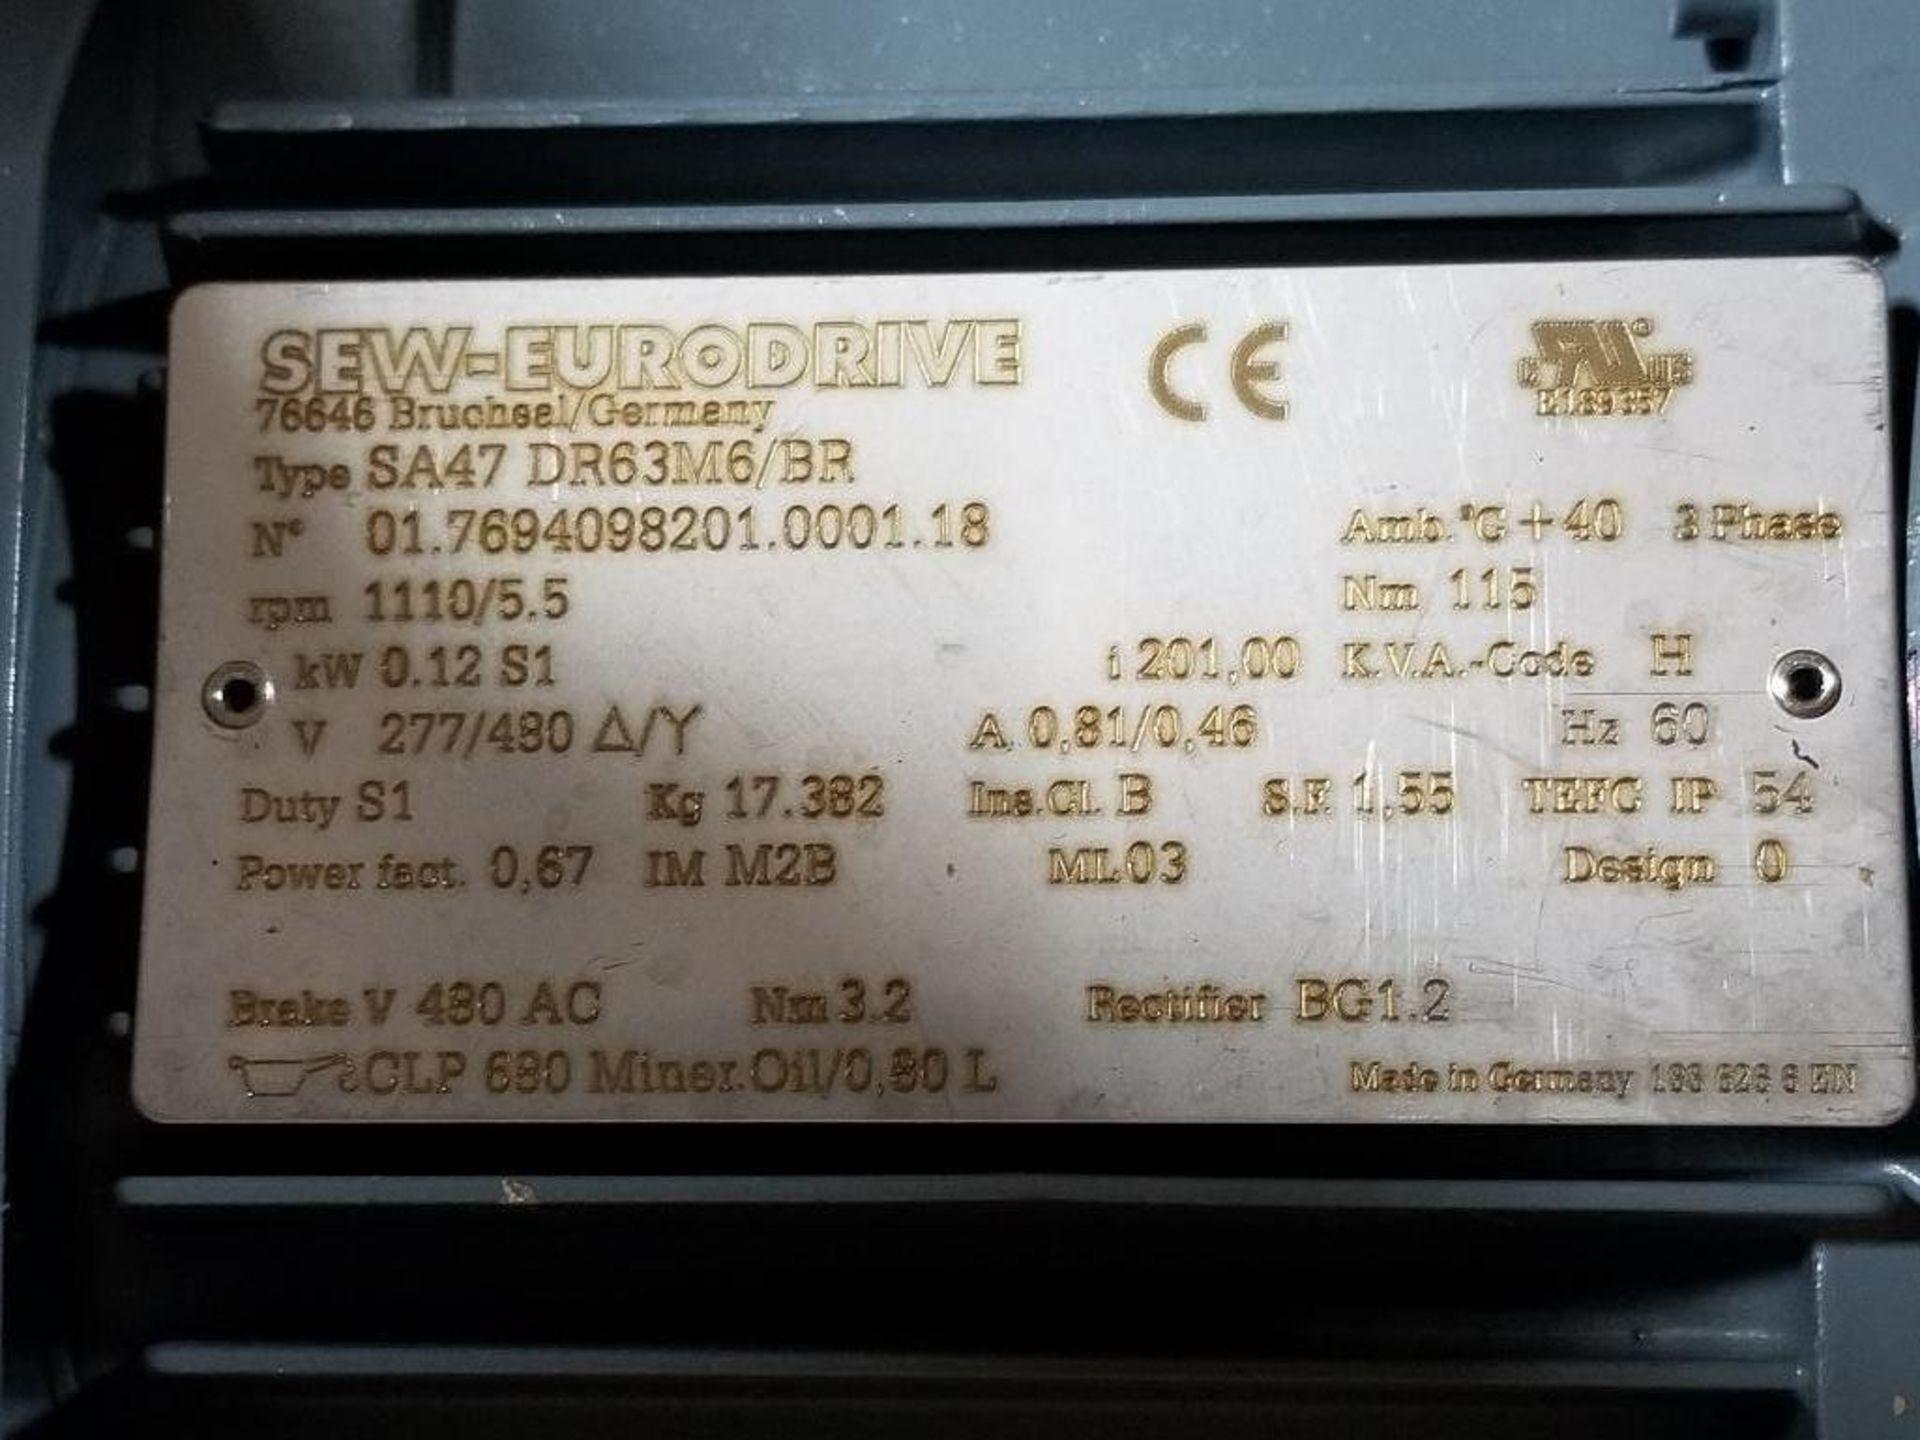 0.12kW Sew-Eurodrive Type-SA47 motor. 01.7694098201.0001.18 277/480V, 1110RPM. - Image 3 of 3